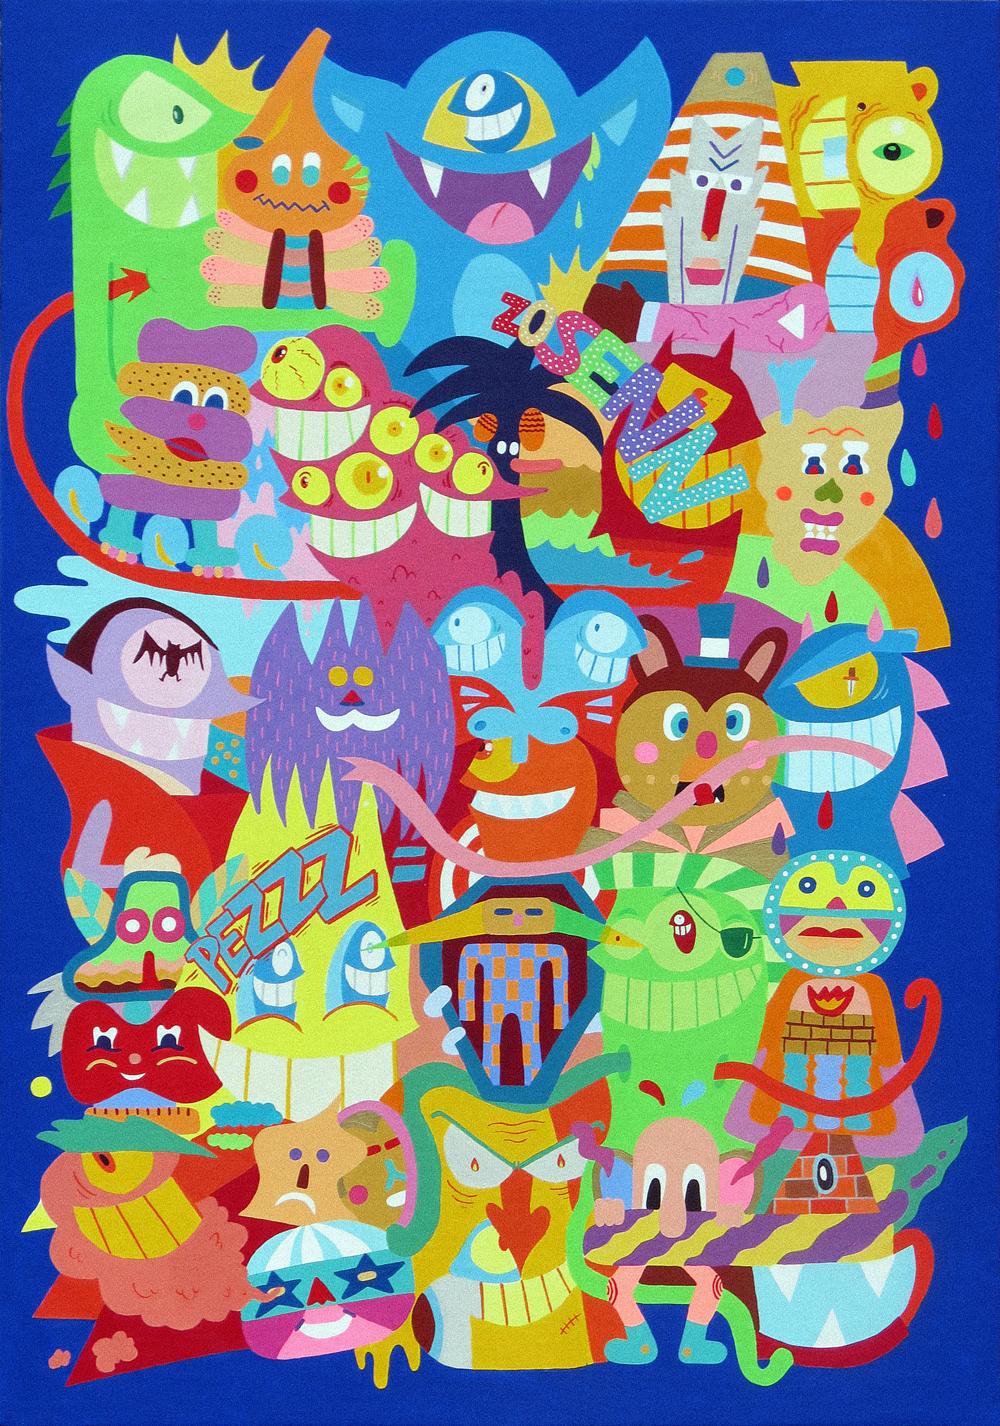 pez and zosen_mixed media on canvas_72 x 102 x 5cm_£2200.jpg